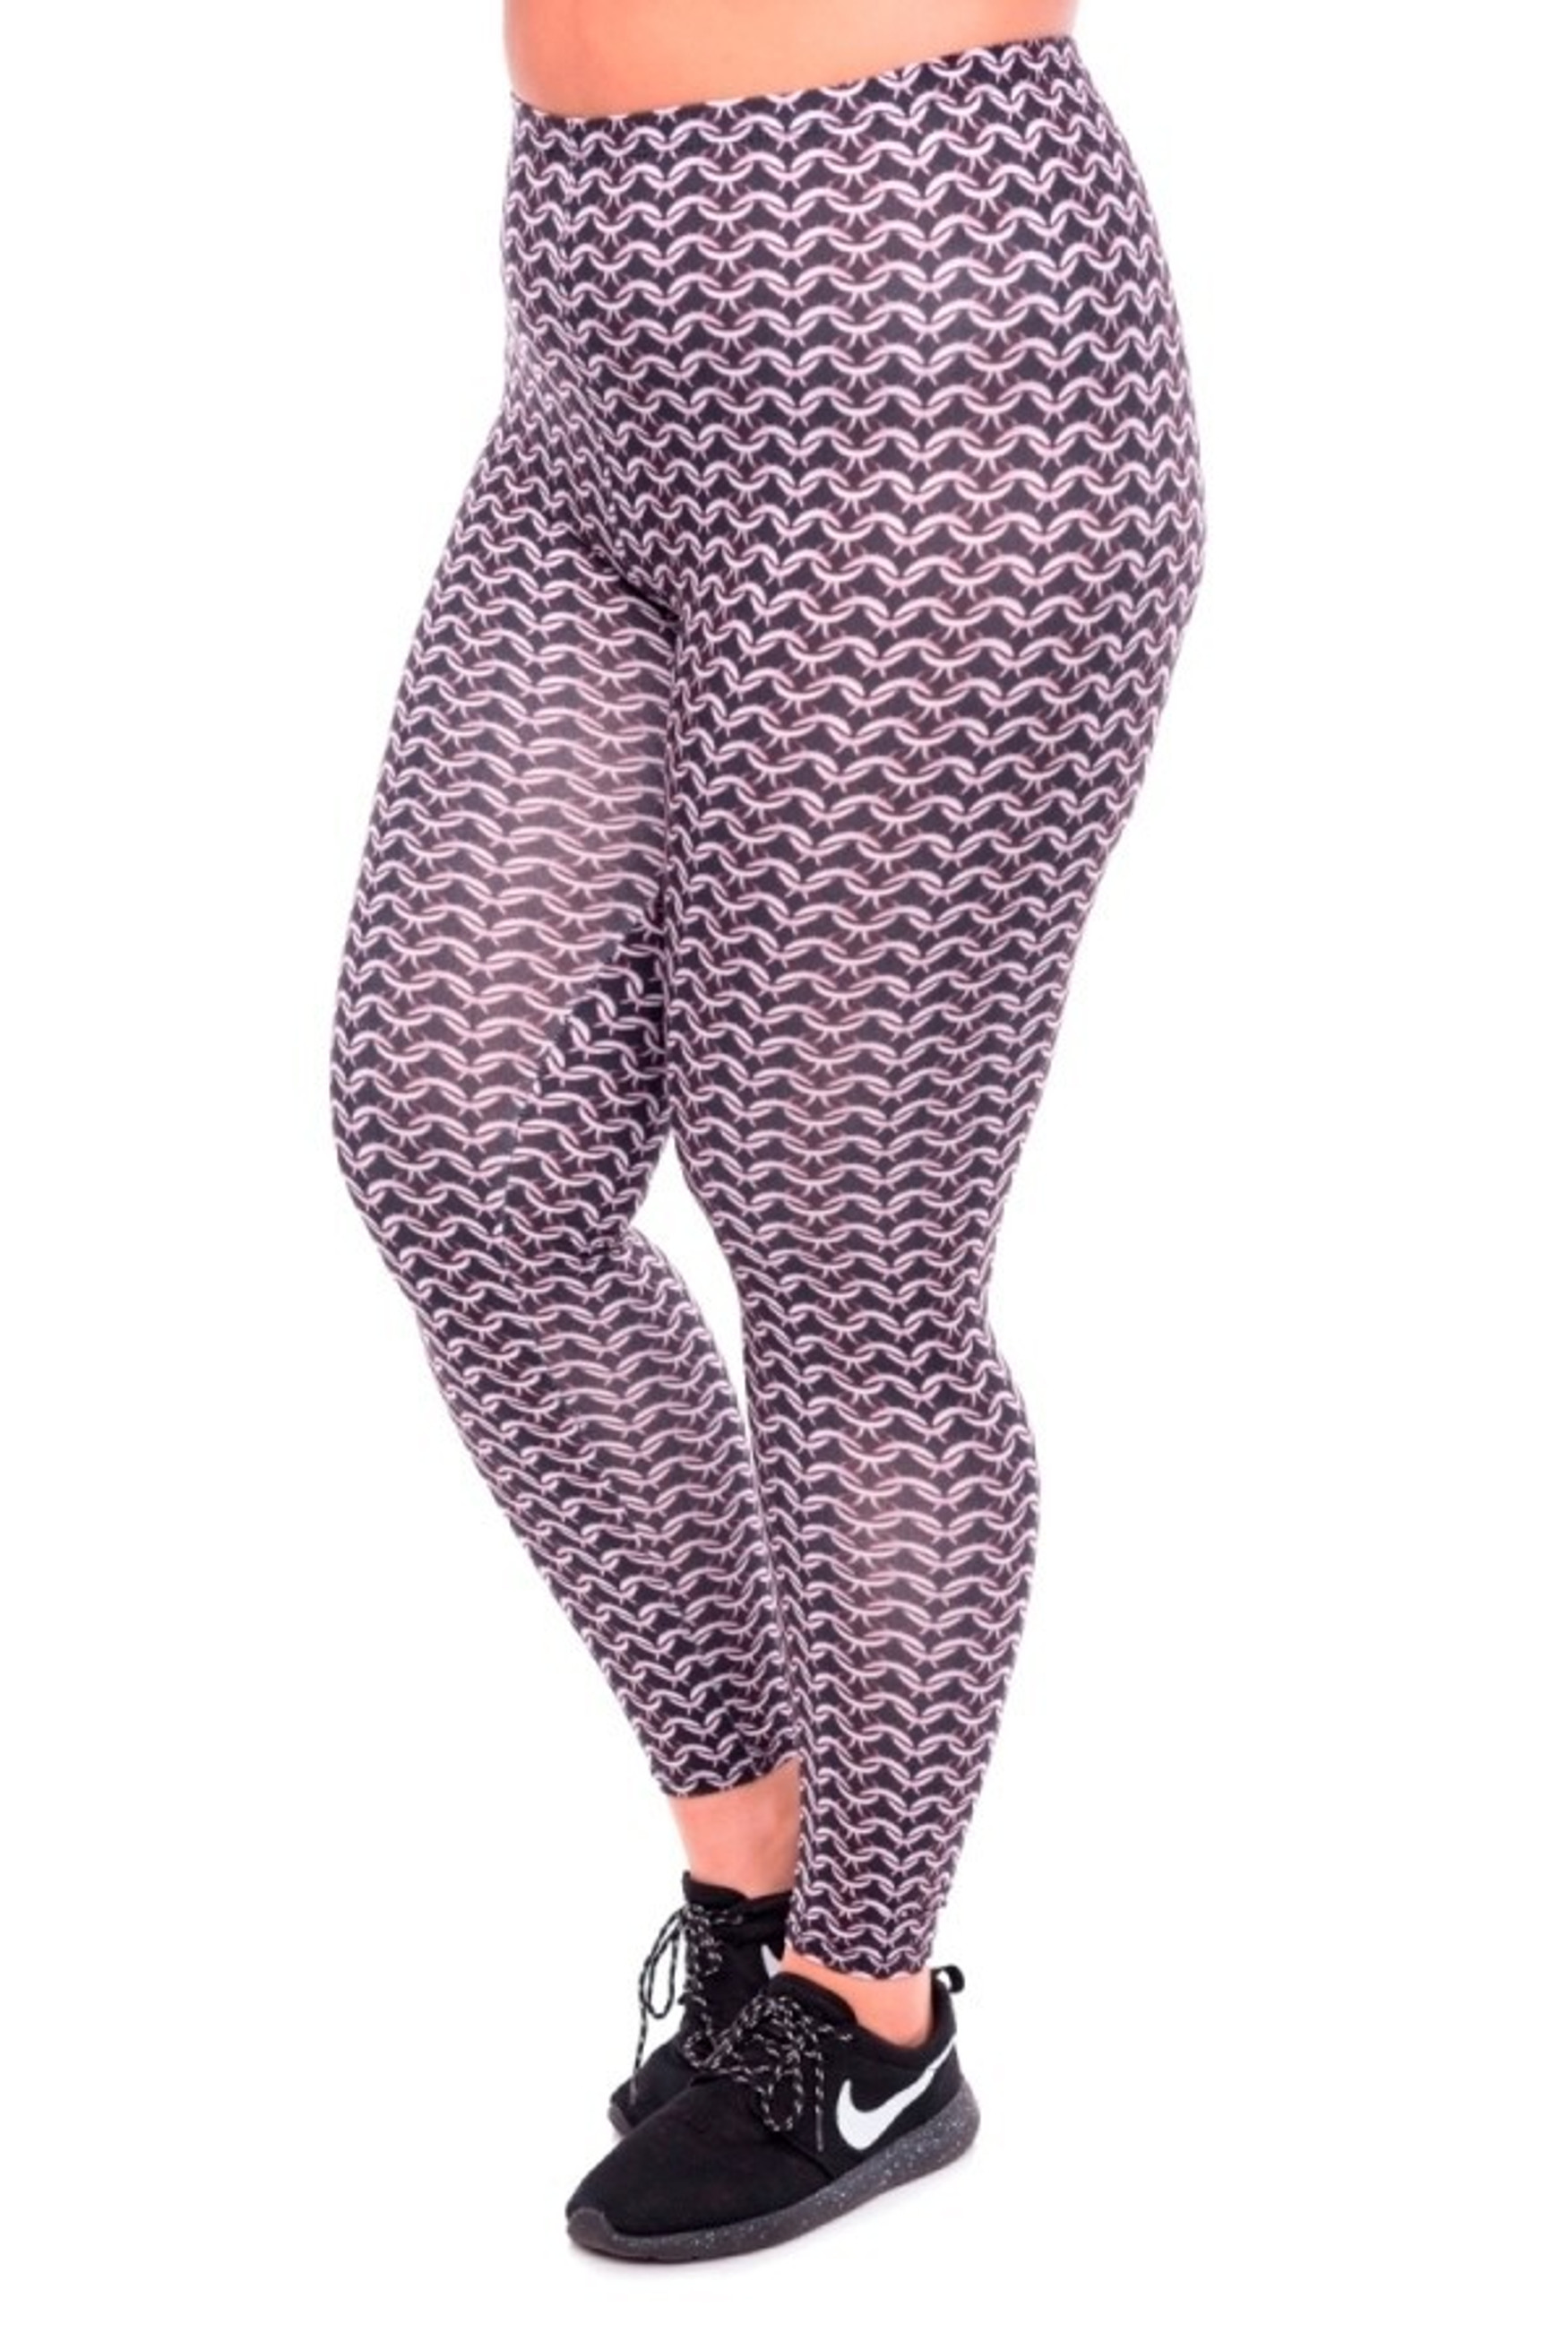 Chain Mail Leggings - Plus Size